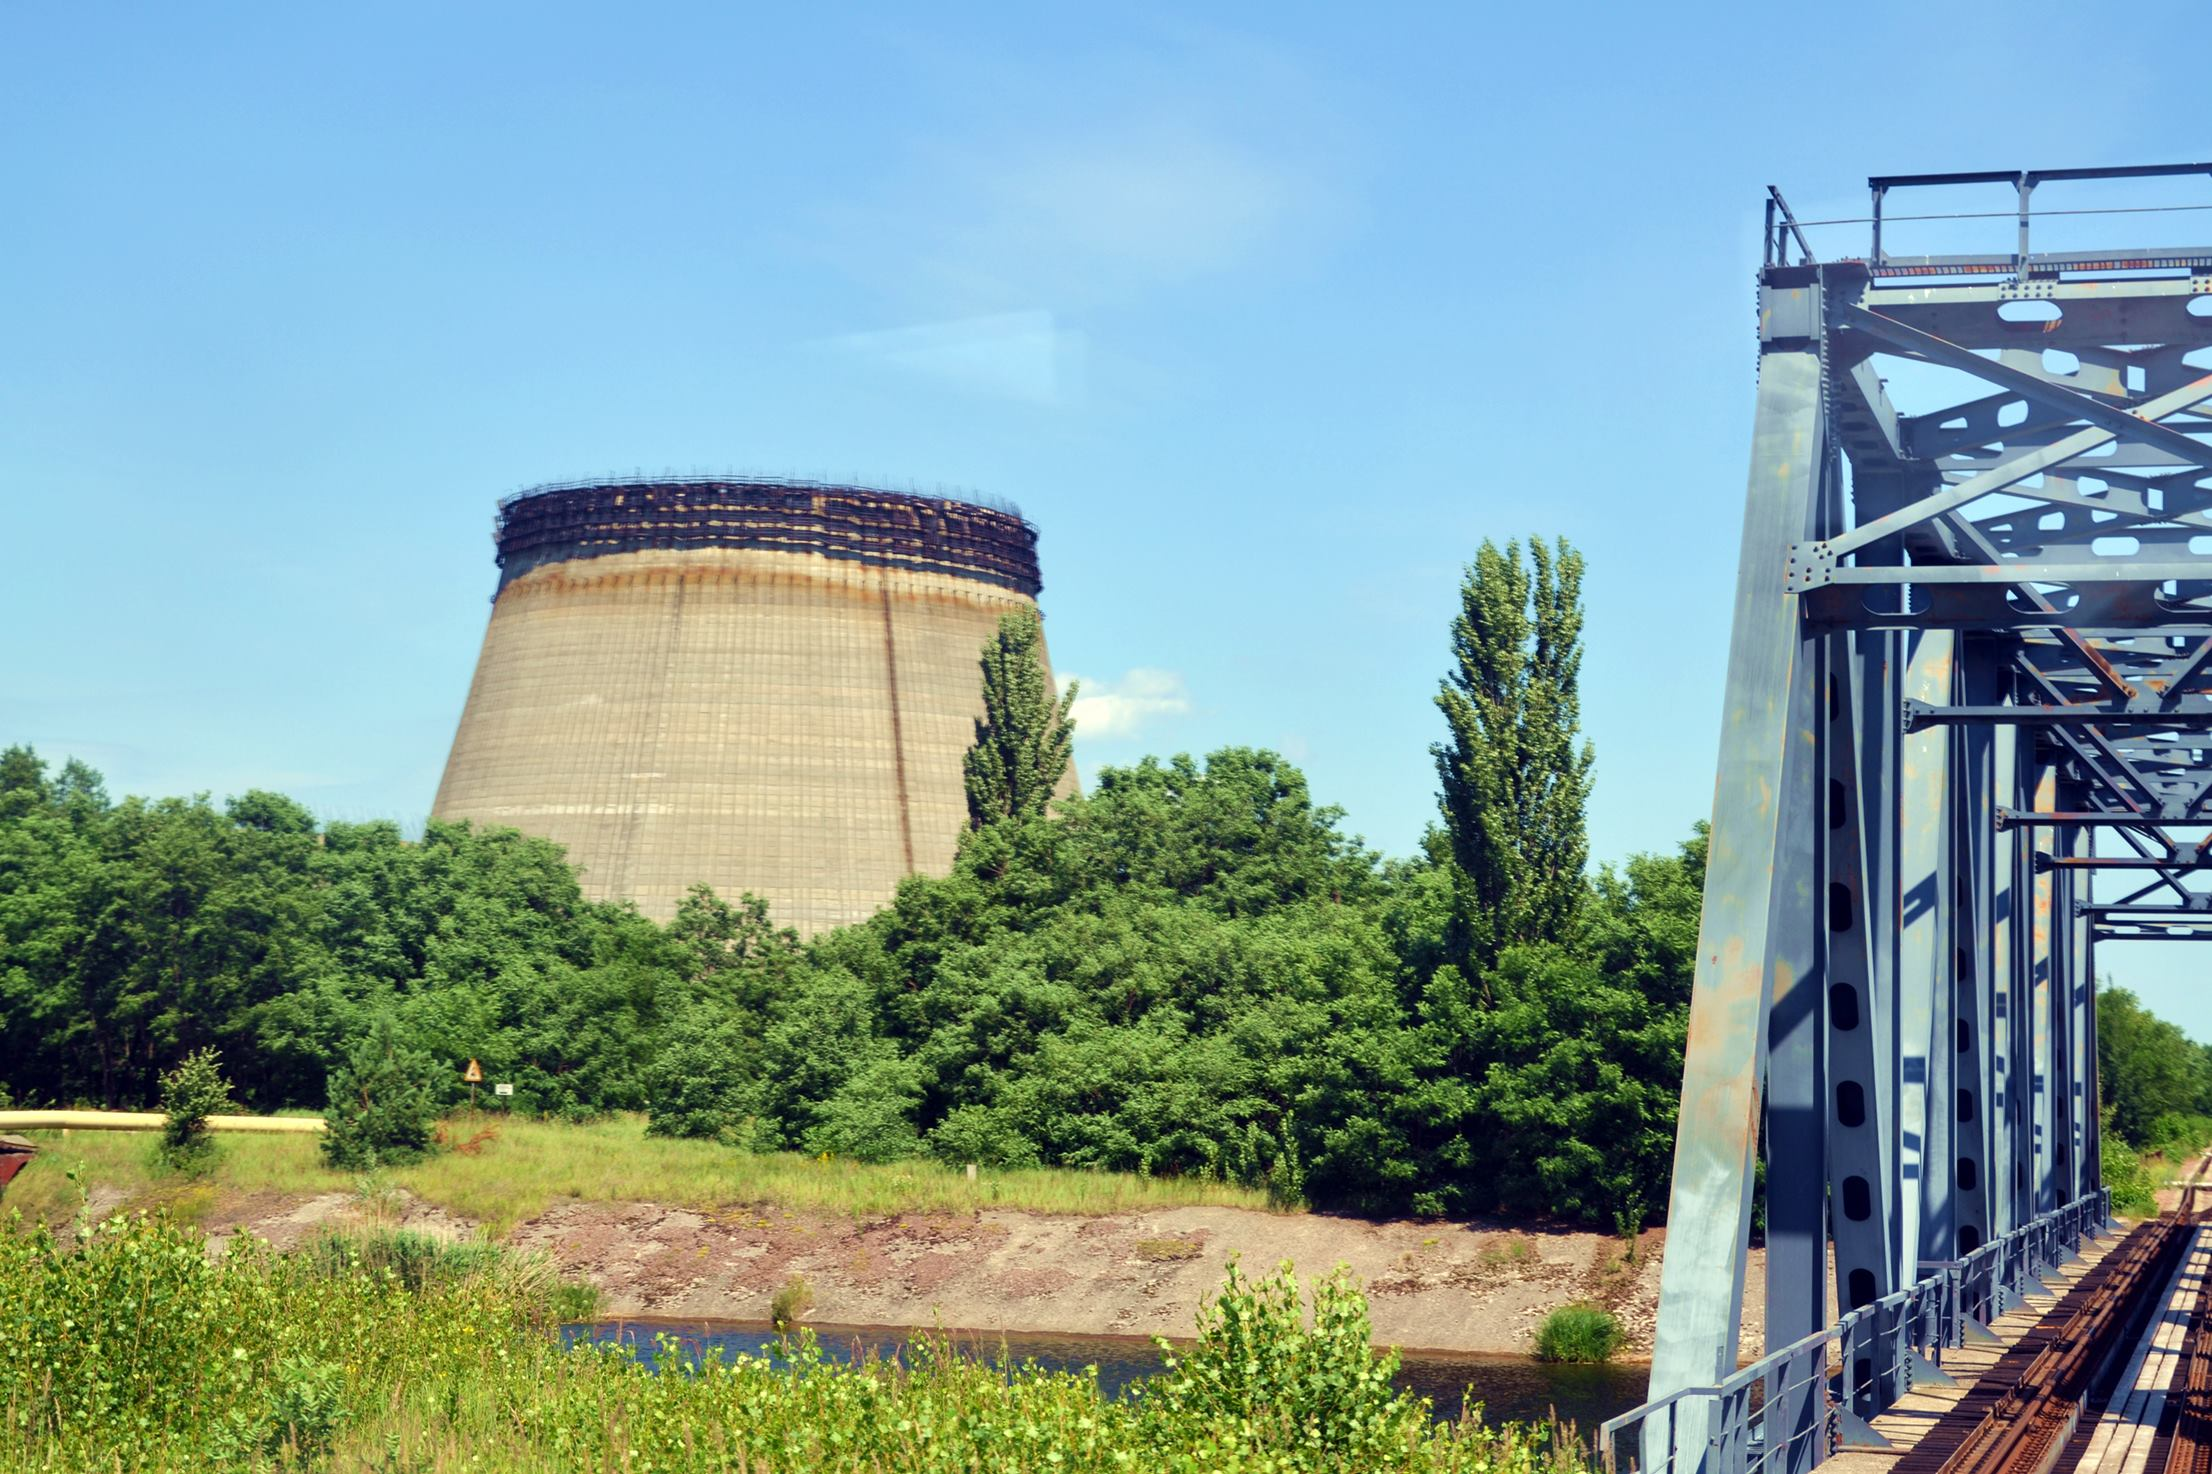 chernobyl_ucrania_reator